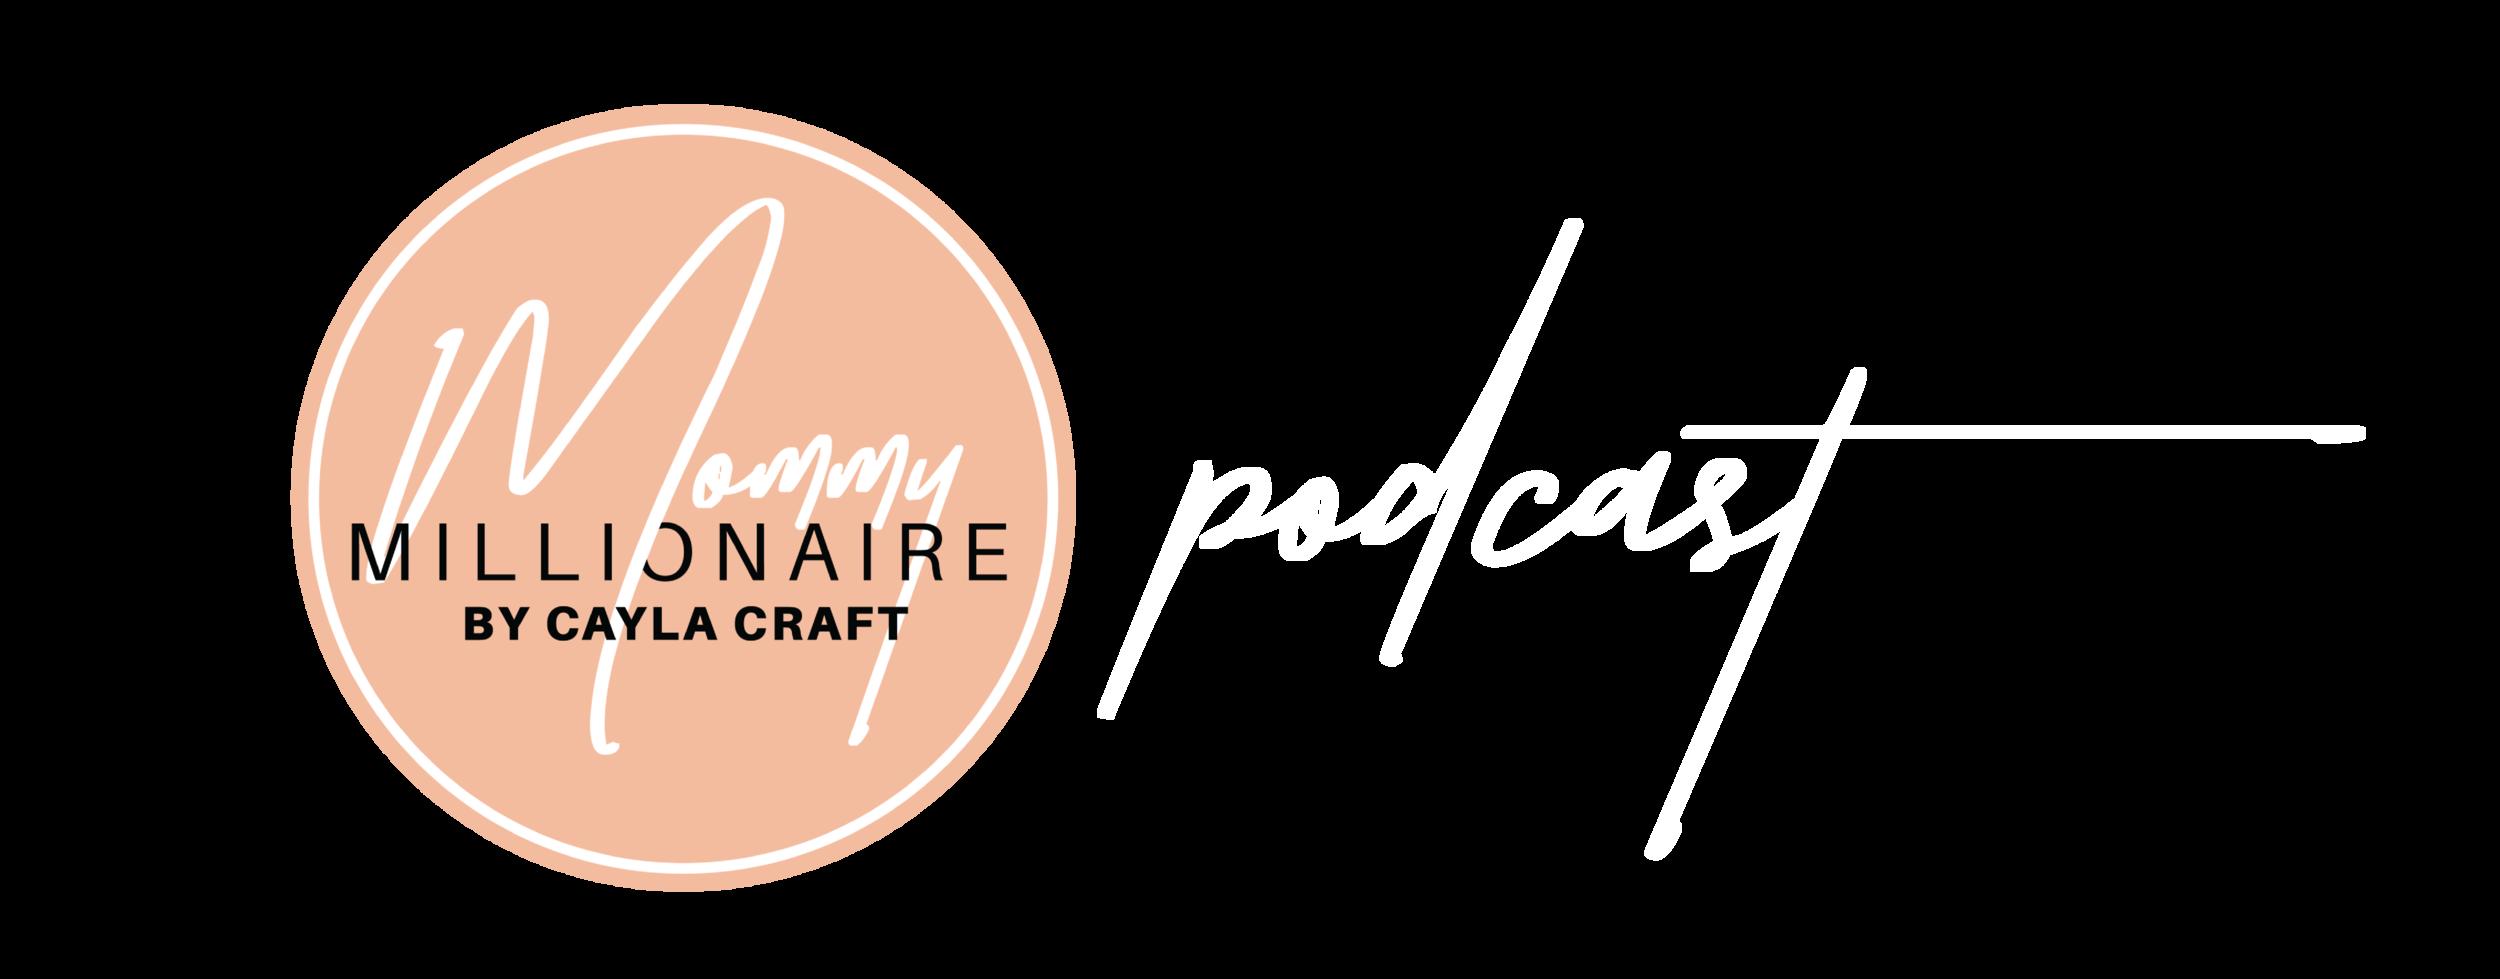 podcast logo-01.png